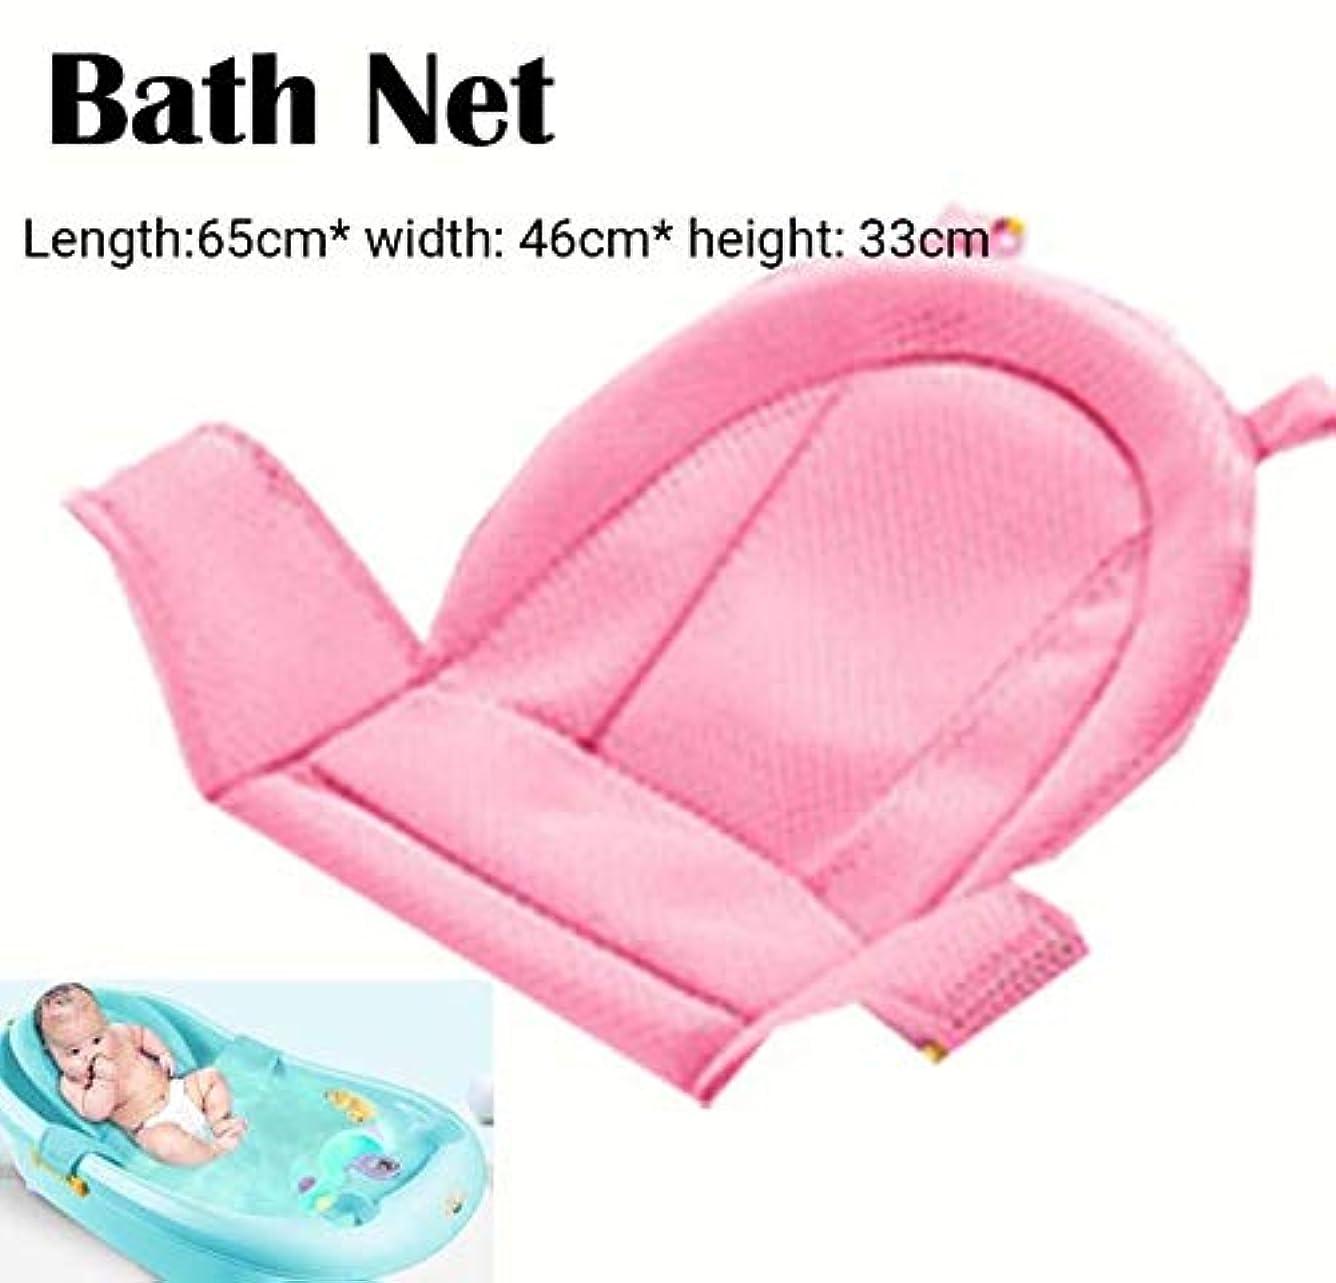 SMART 漫画ポータブル赤ちゃんノンスリップバスタブシャワー浴槽マット新生児安全セキュリティバスエアクッション折りたたみソフト枕シート クッション 椅子